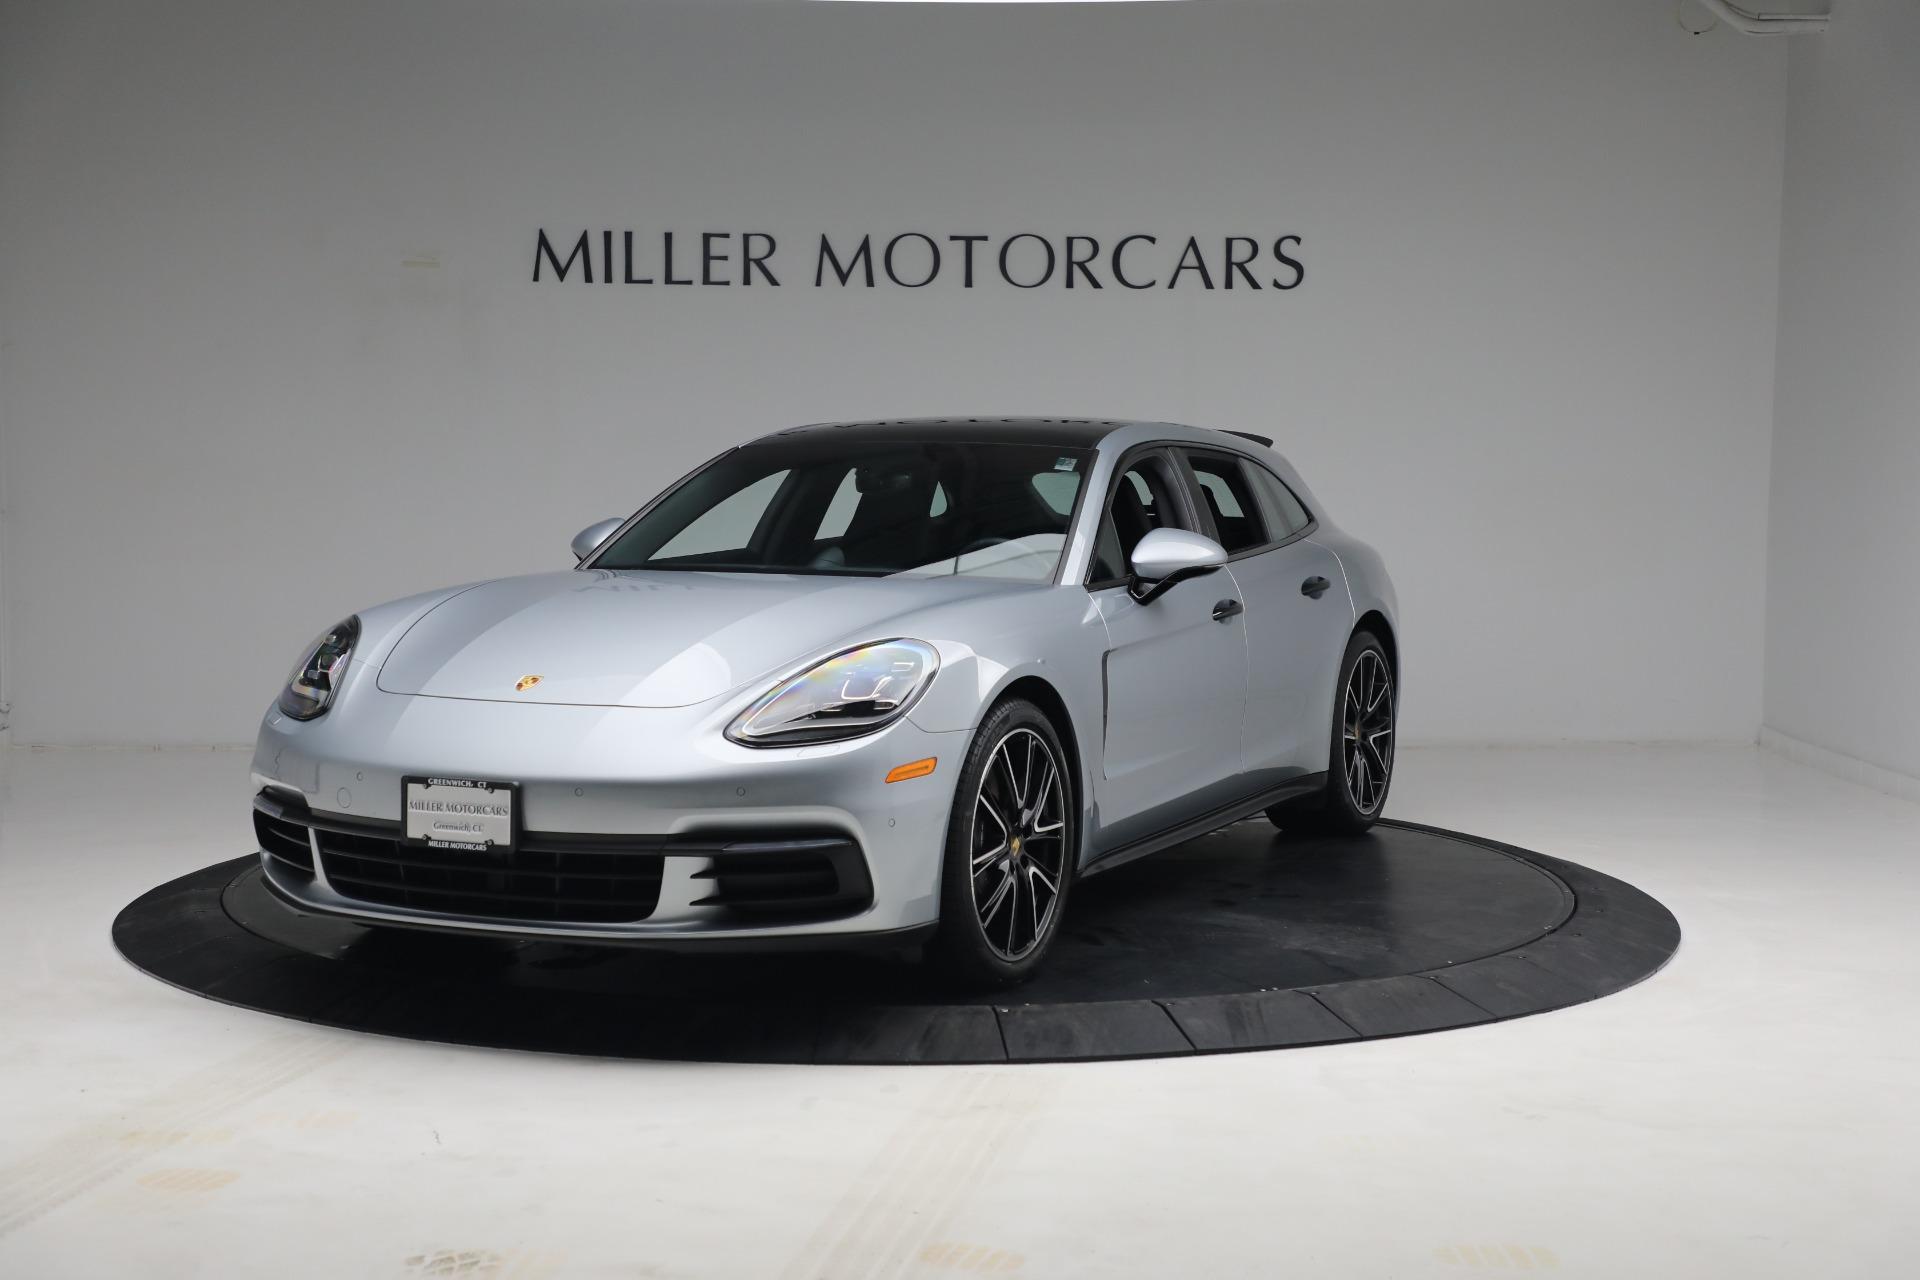 Used 2018 Porsche Panamera 4 Sport Turismo for sale $97,900 at Maserati of Greenwich in Greenwich CT 06830 1